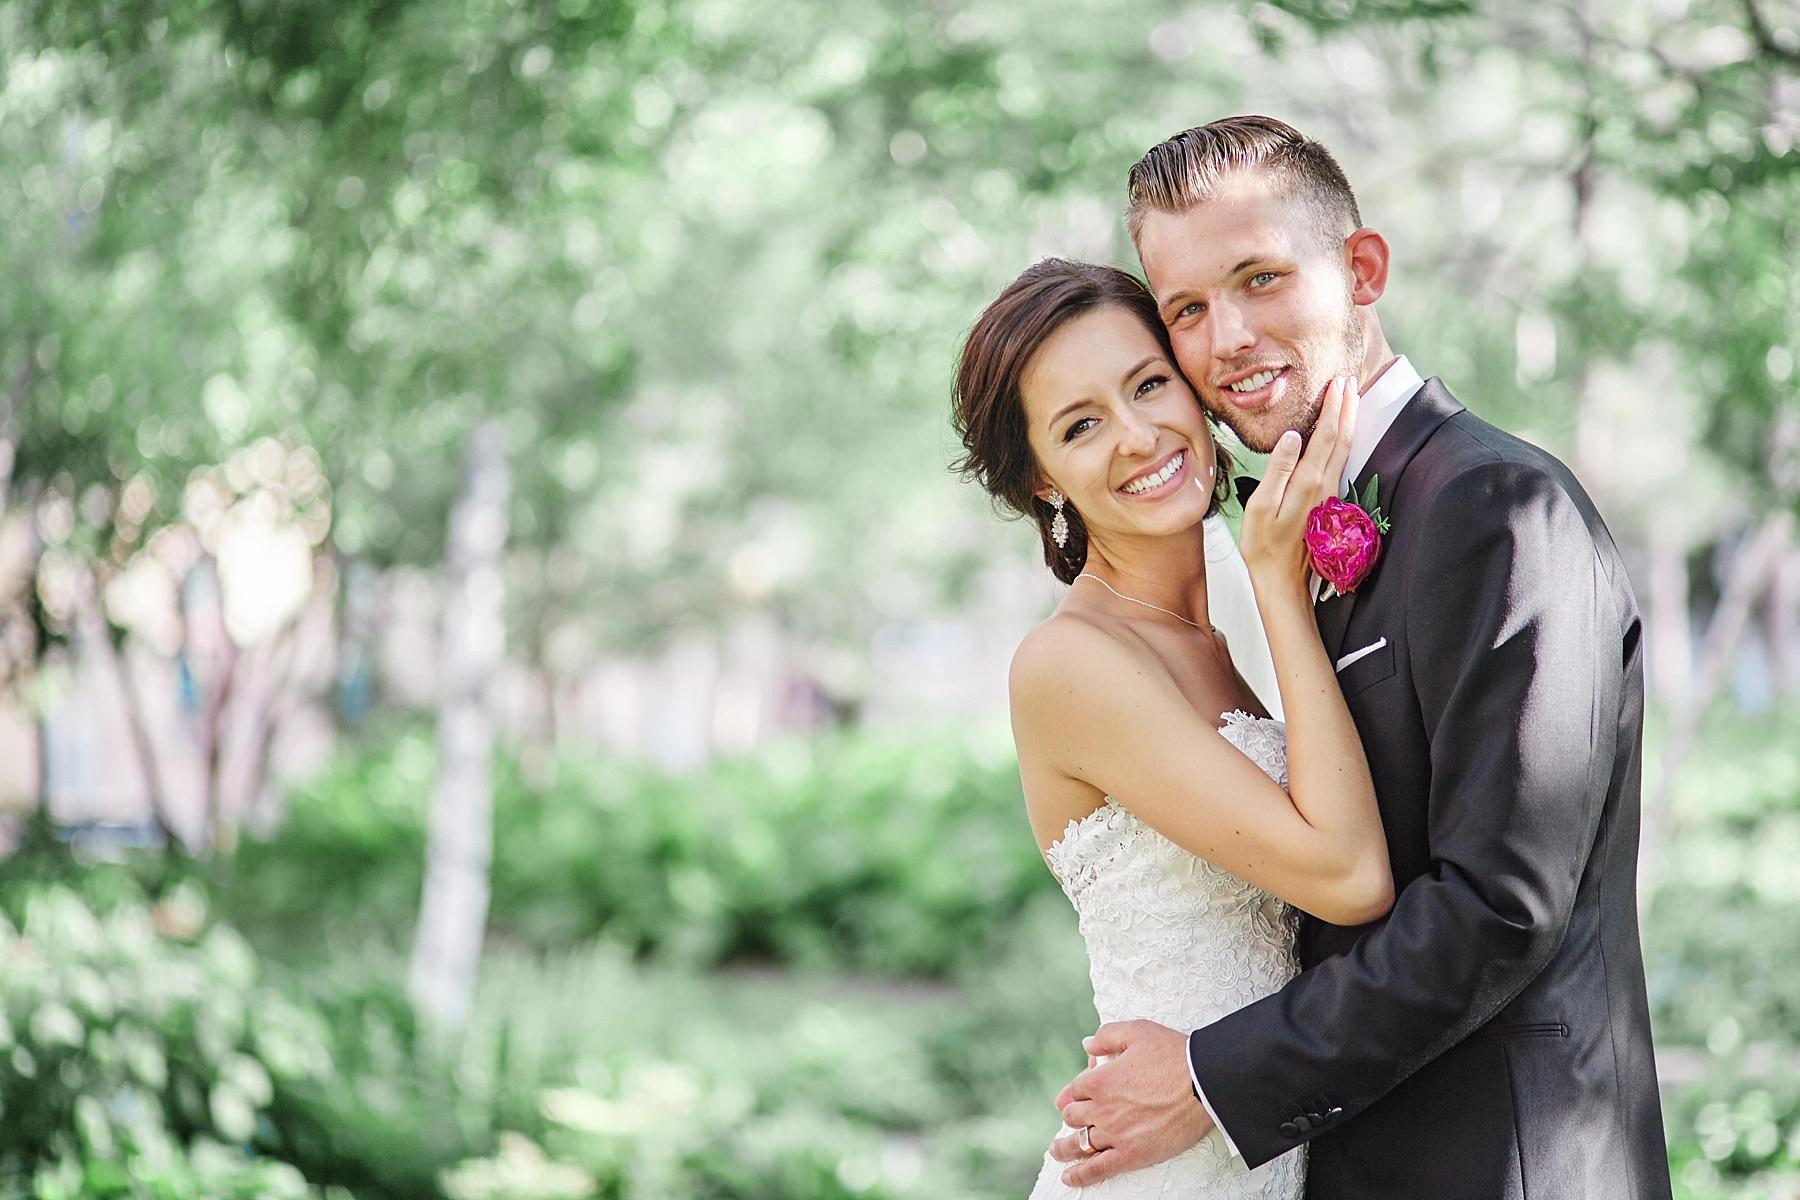 ABULAE-Wedding-Saint-paul-MN-Josh-Sofia-Wedding-Mears-Park_0799.jpg